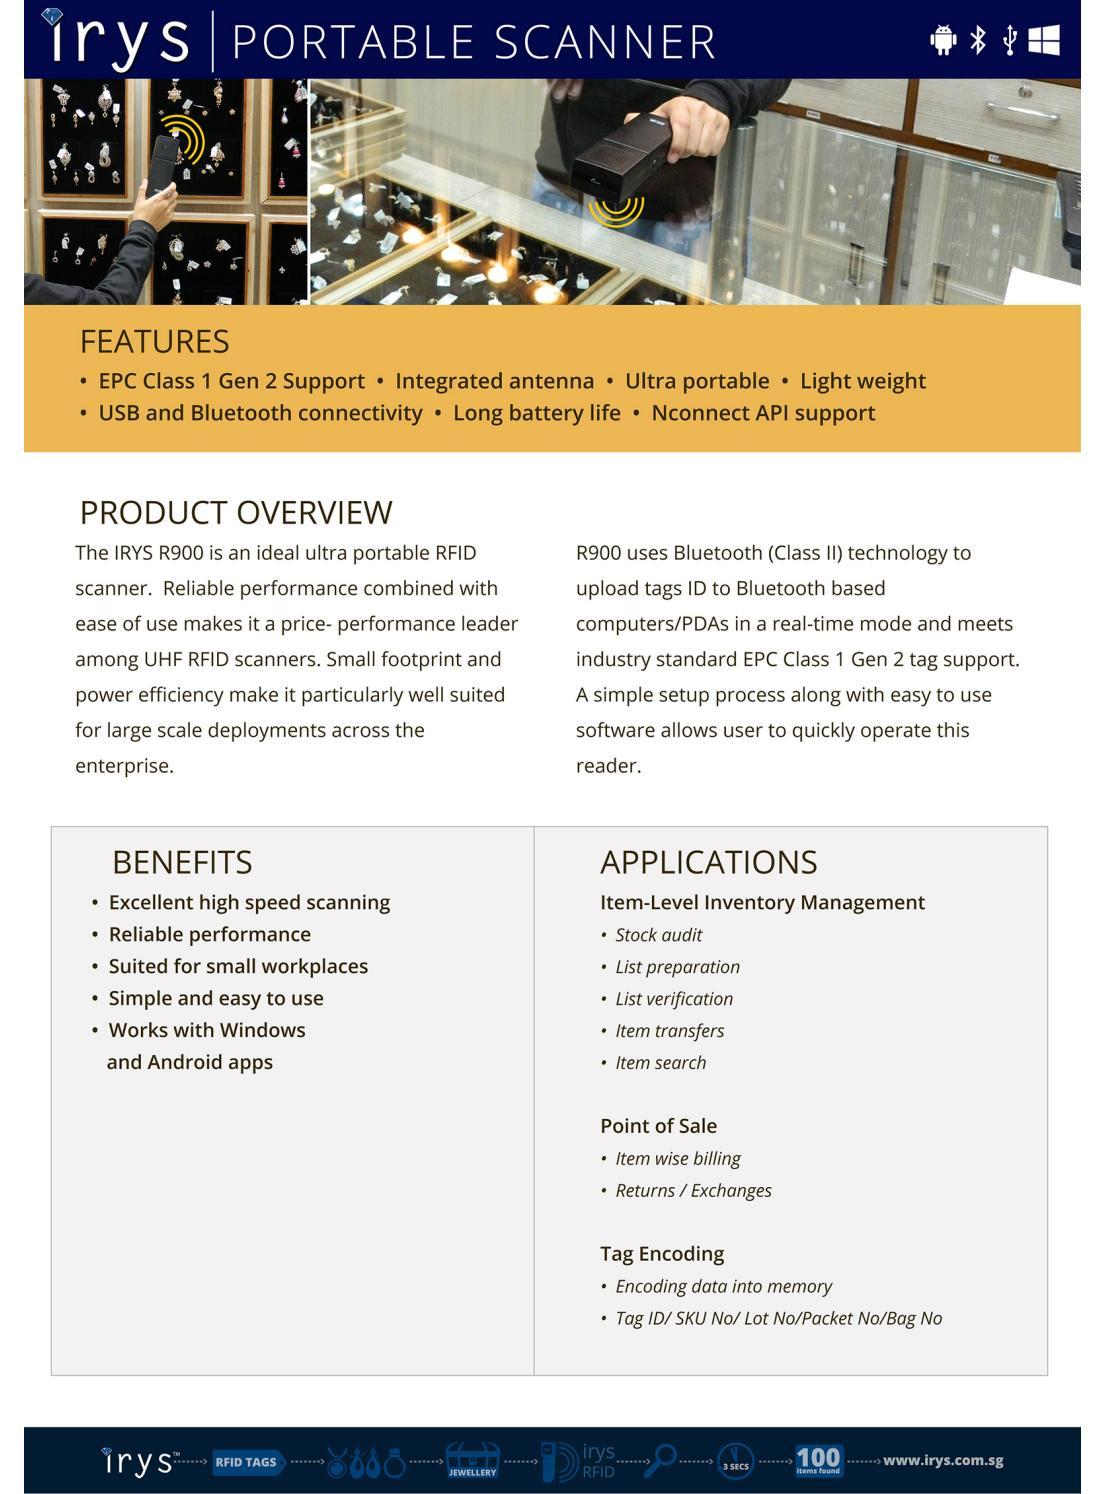 Buy RFID Tags, RFID Portable Scanners - Irys Pte  Ltd  by